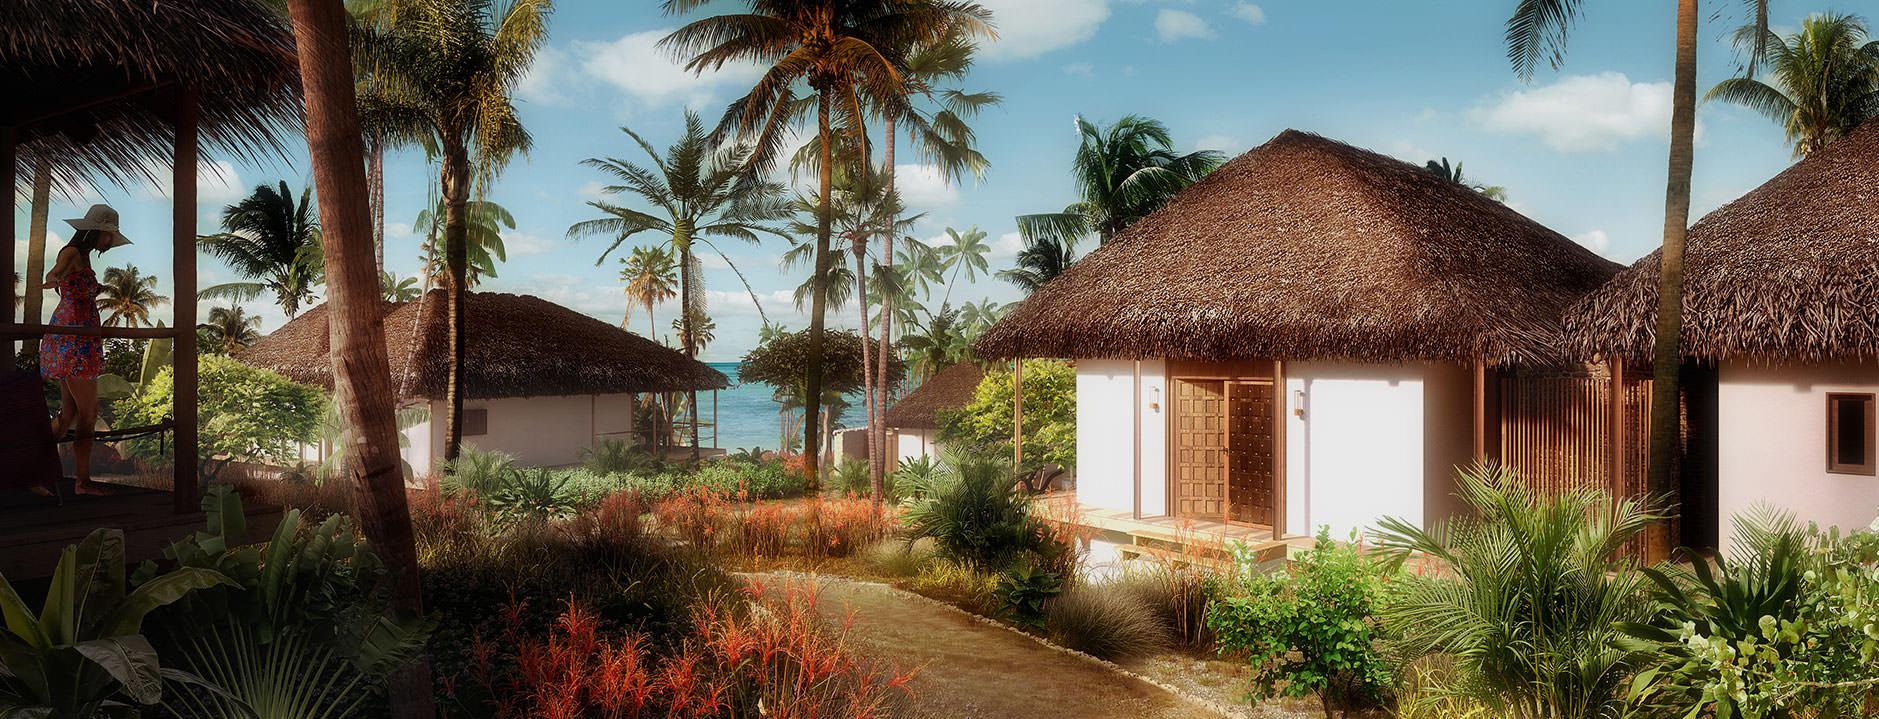 Zuri Zanzibar 2